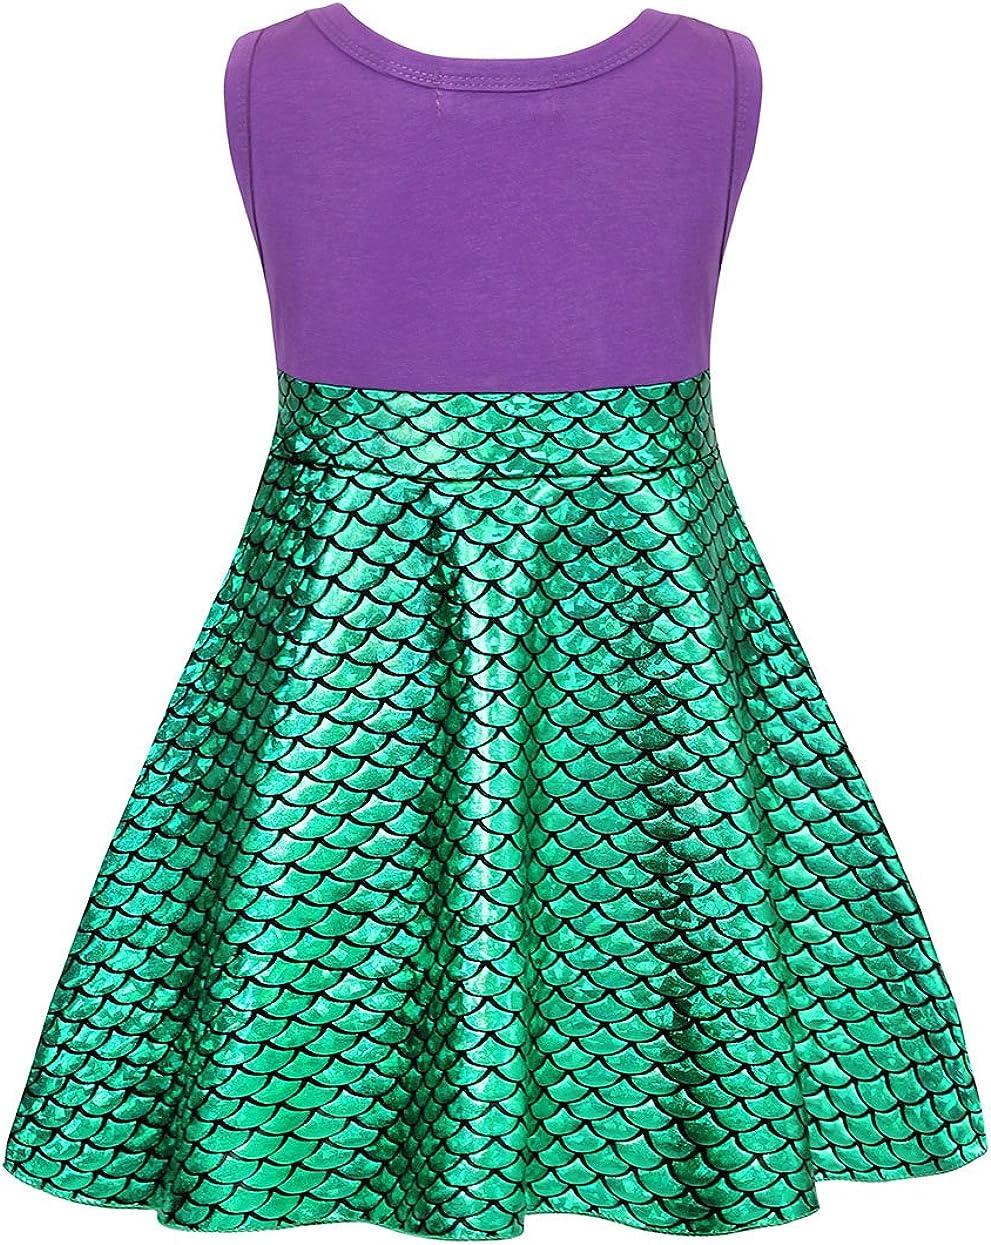 Jurebecia Mermaid Dress Little Girls Ariel Princess Party Kids Sequin Sleeveless Costume Cosplay Halloween Scale Skirt